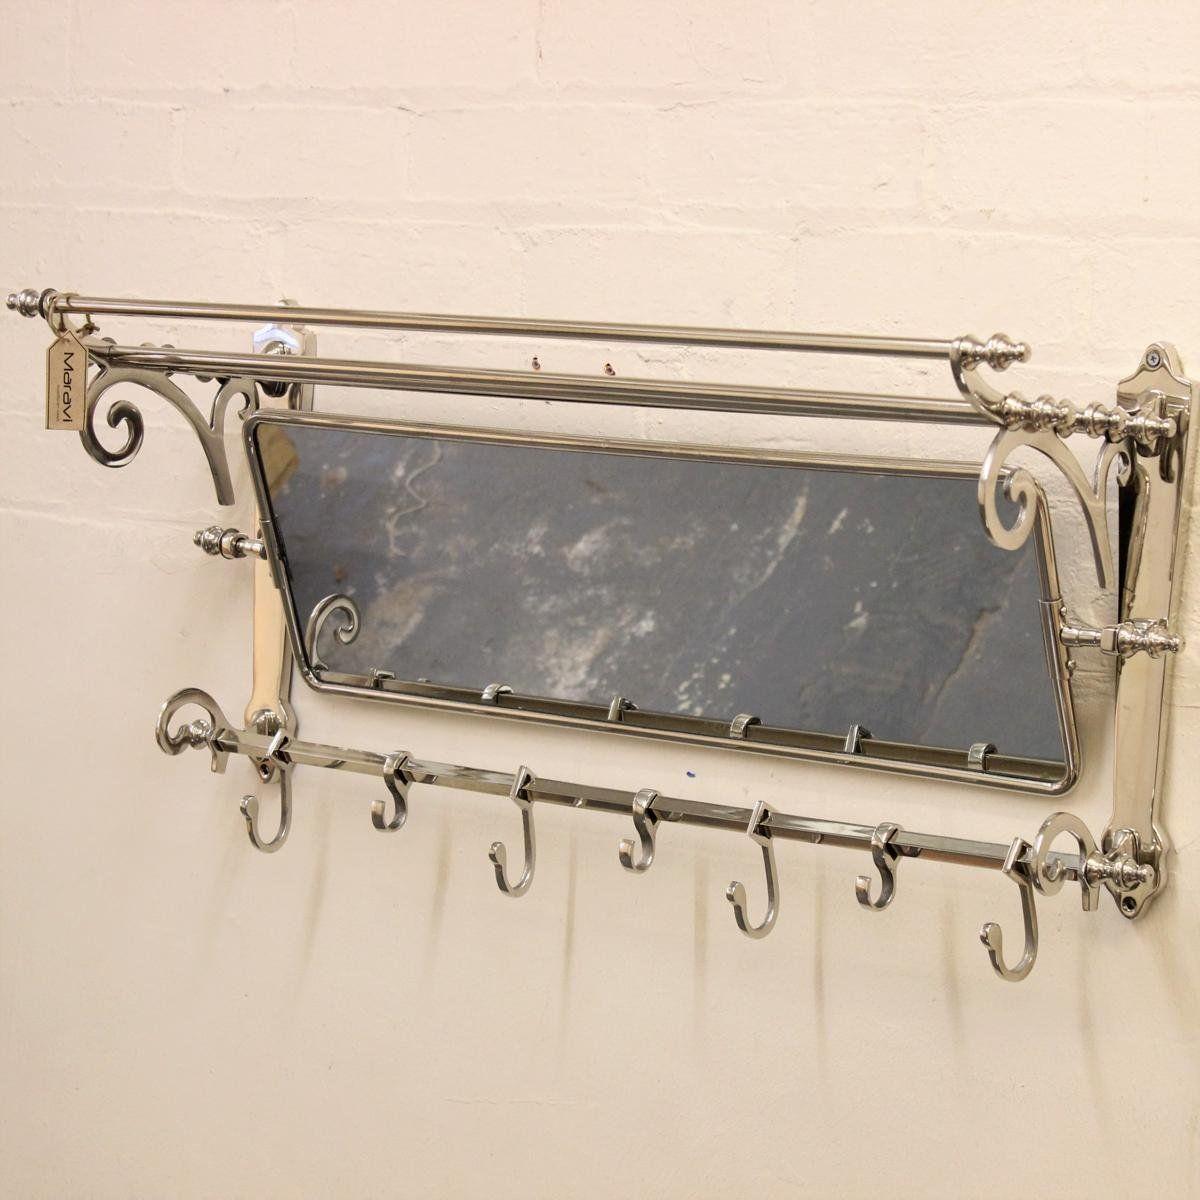 Amazonsmile Maravi Lohit Coat Train Rack With Mirror Wall Mounted Vintage With 7 Hooks Kitchen Amp Dining Coat Rack Wall Wall Hanger Mirror Wall mounted coat rack with mirror